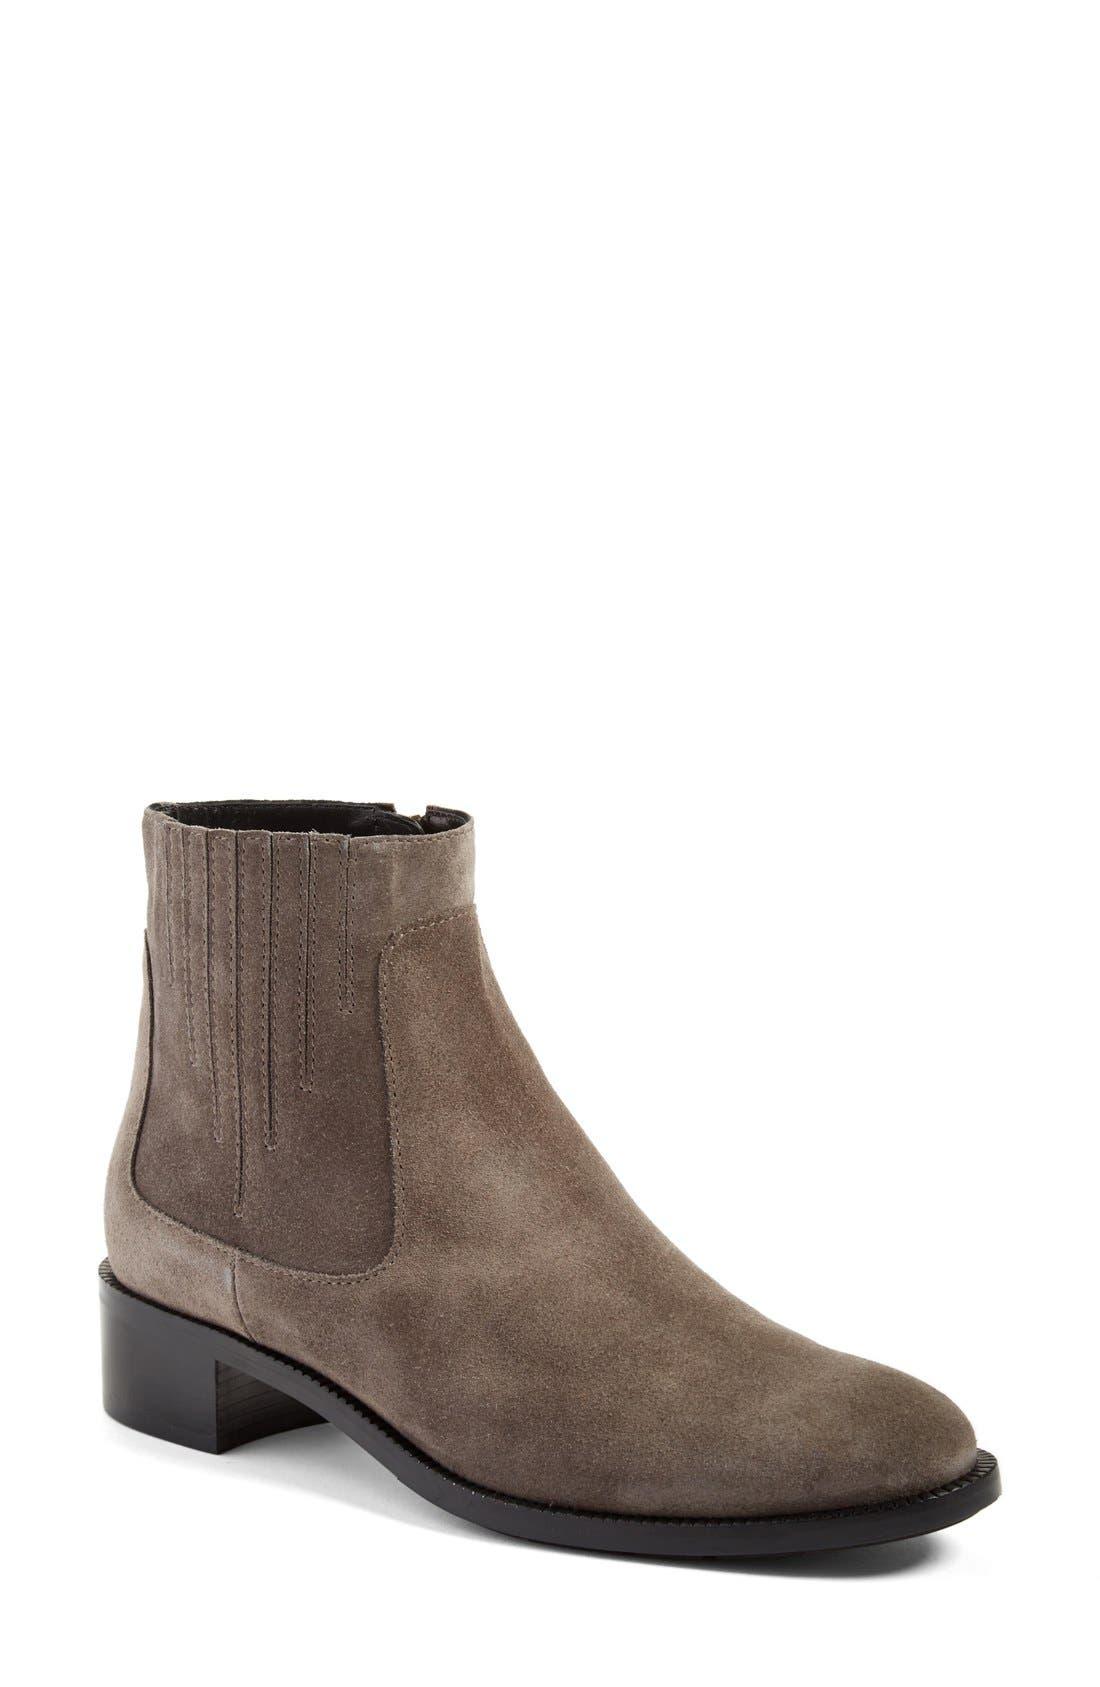 Alternate Image 1 Selected - Aquatalia 'Oribella' Weatherproof Leather Bootie (Women)